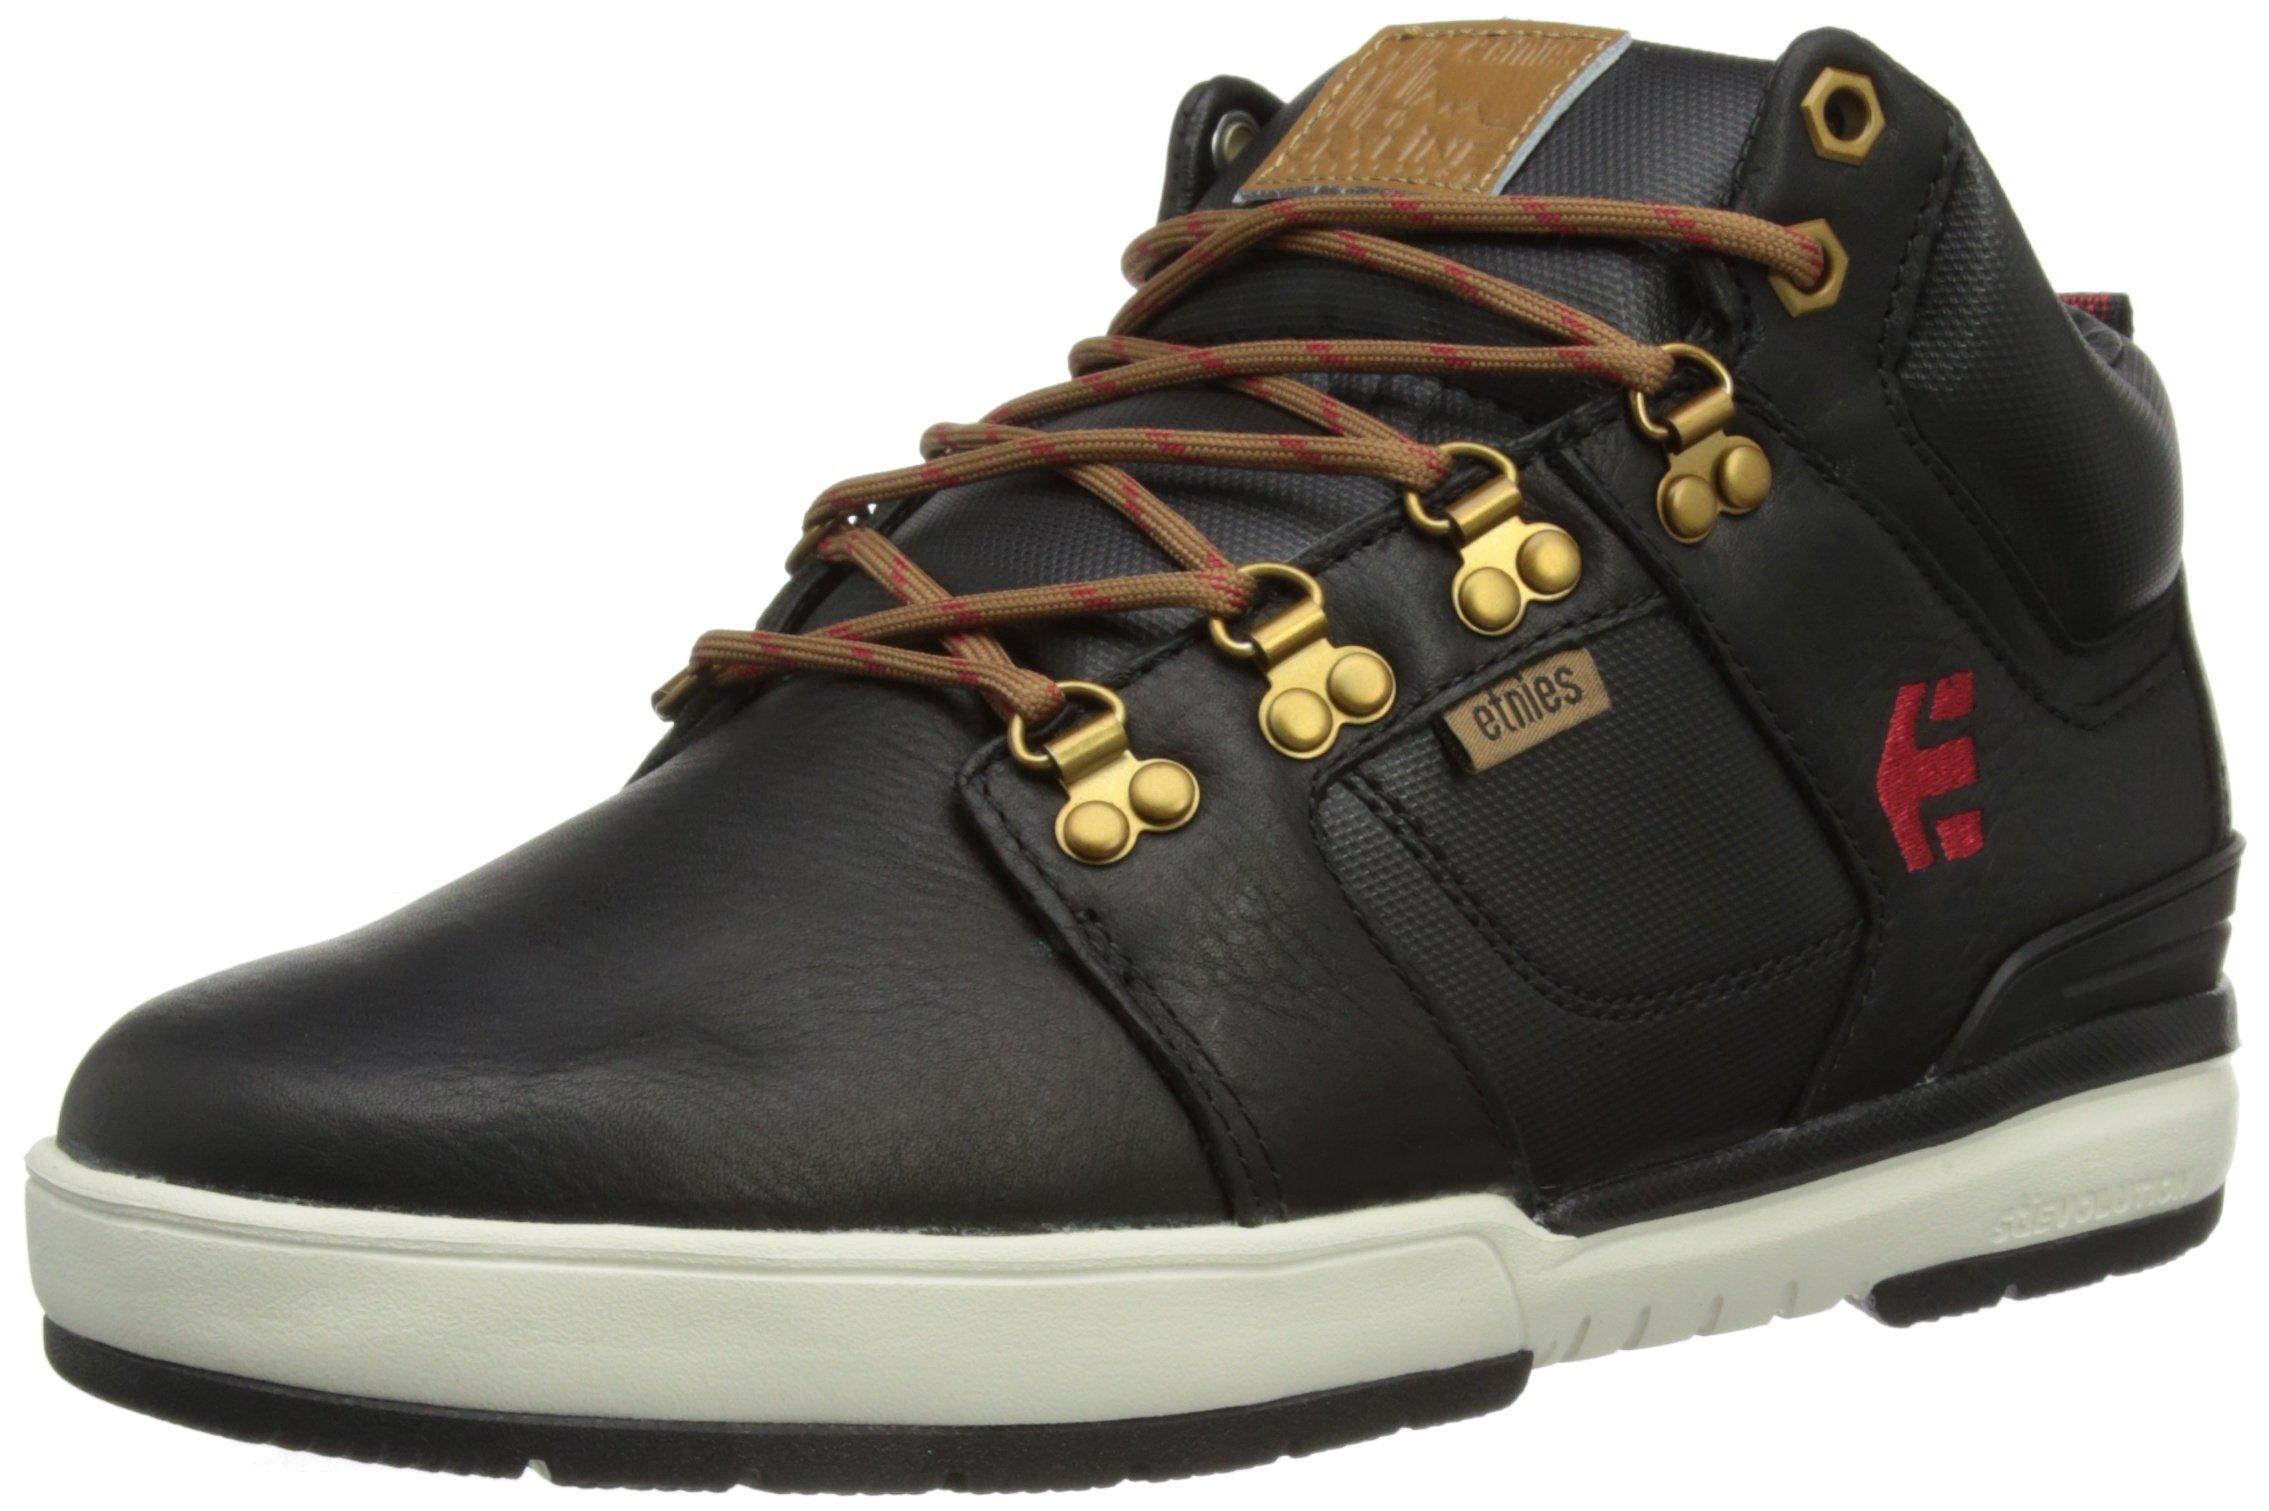 Etnies Men's High Rise ODB LX Skate Shoe,Black,8 D US